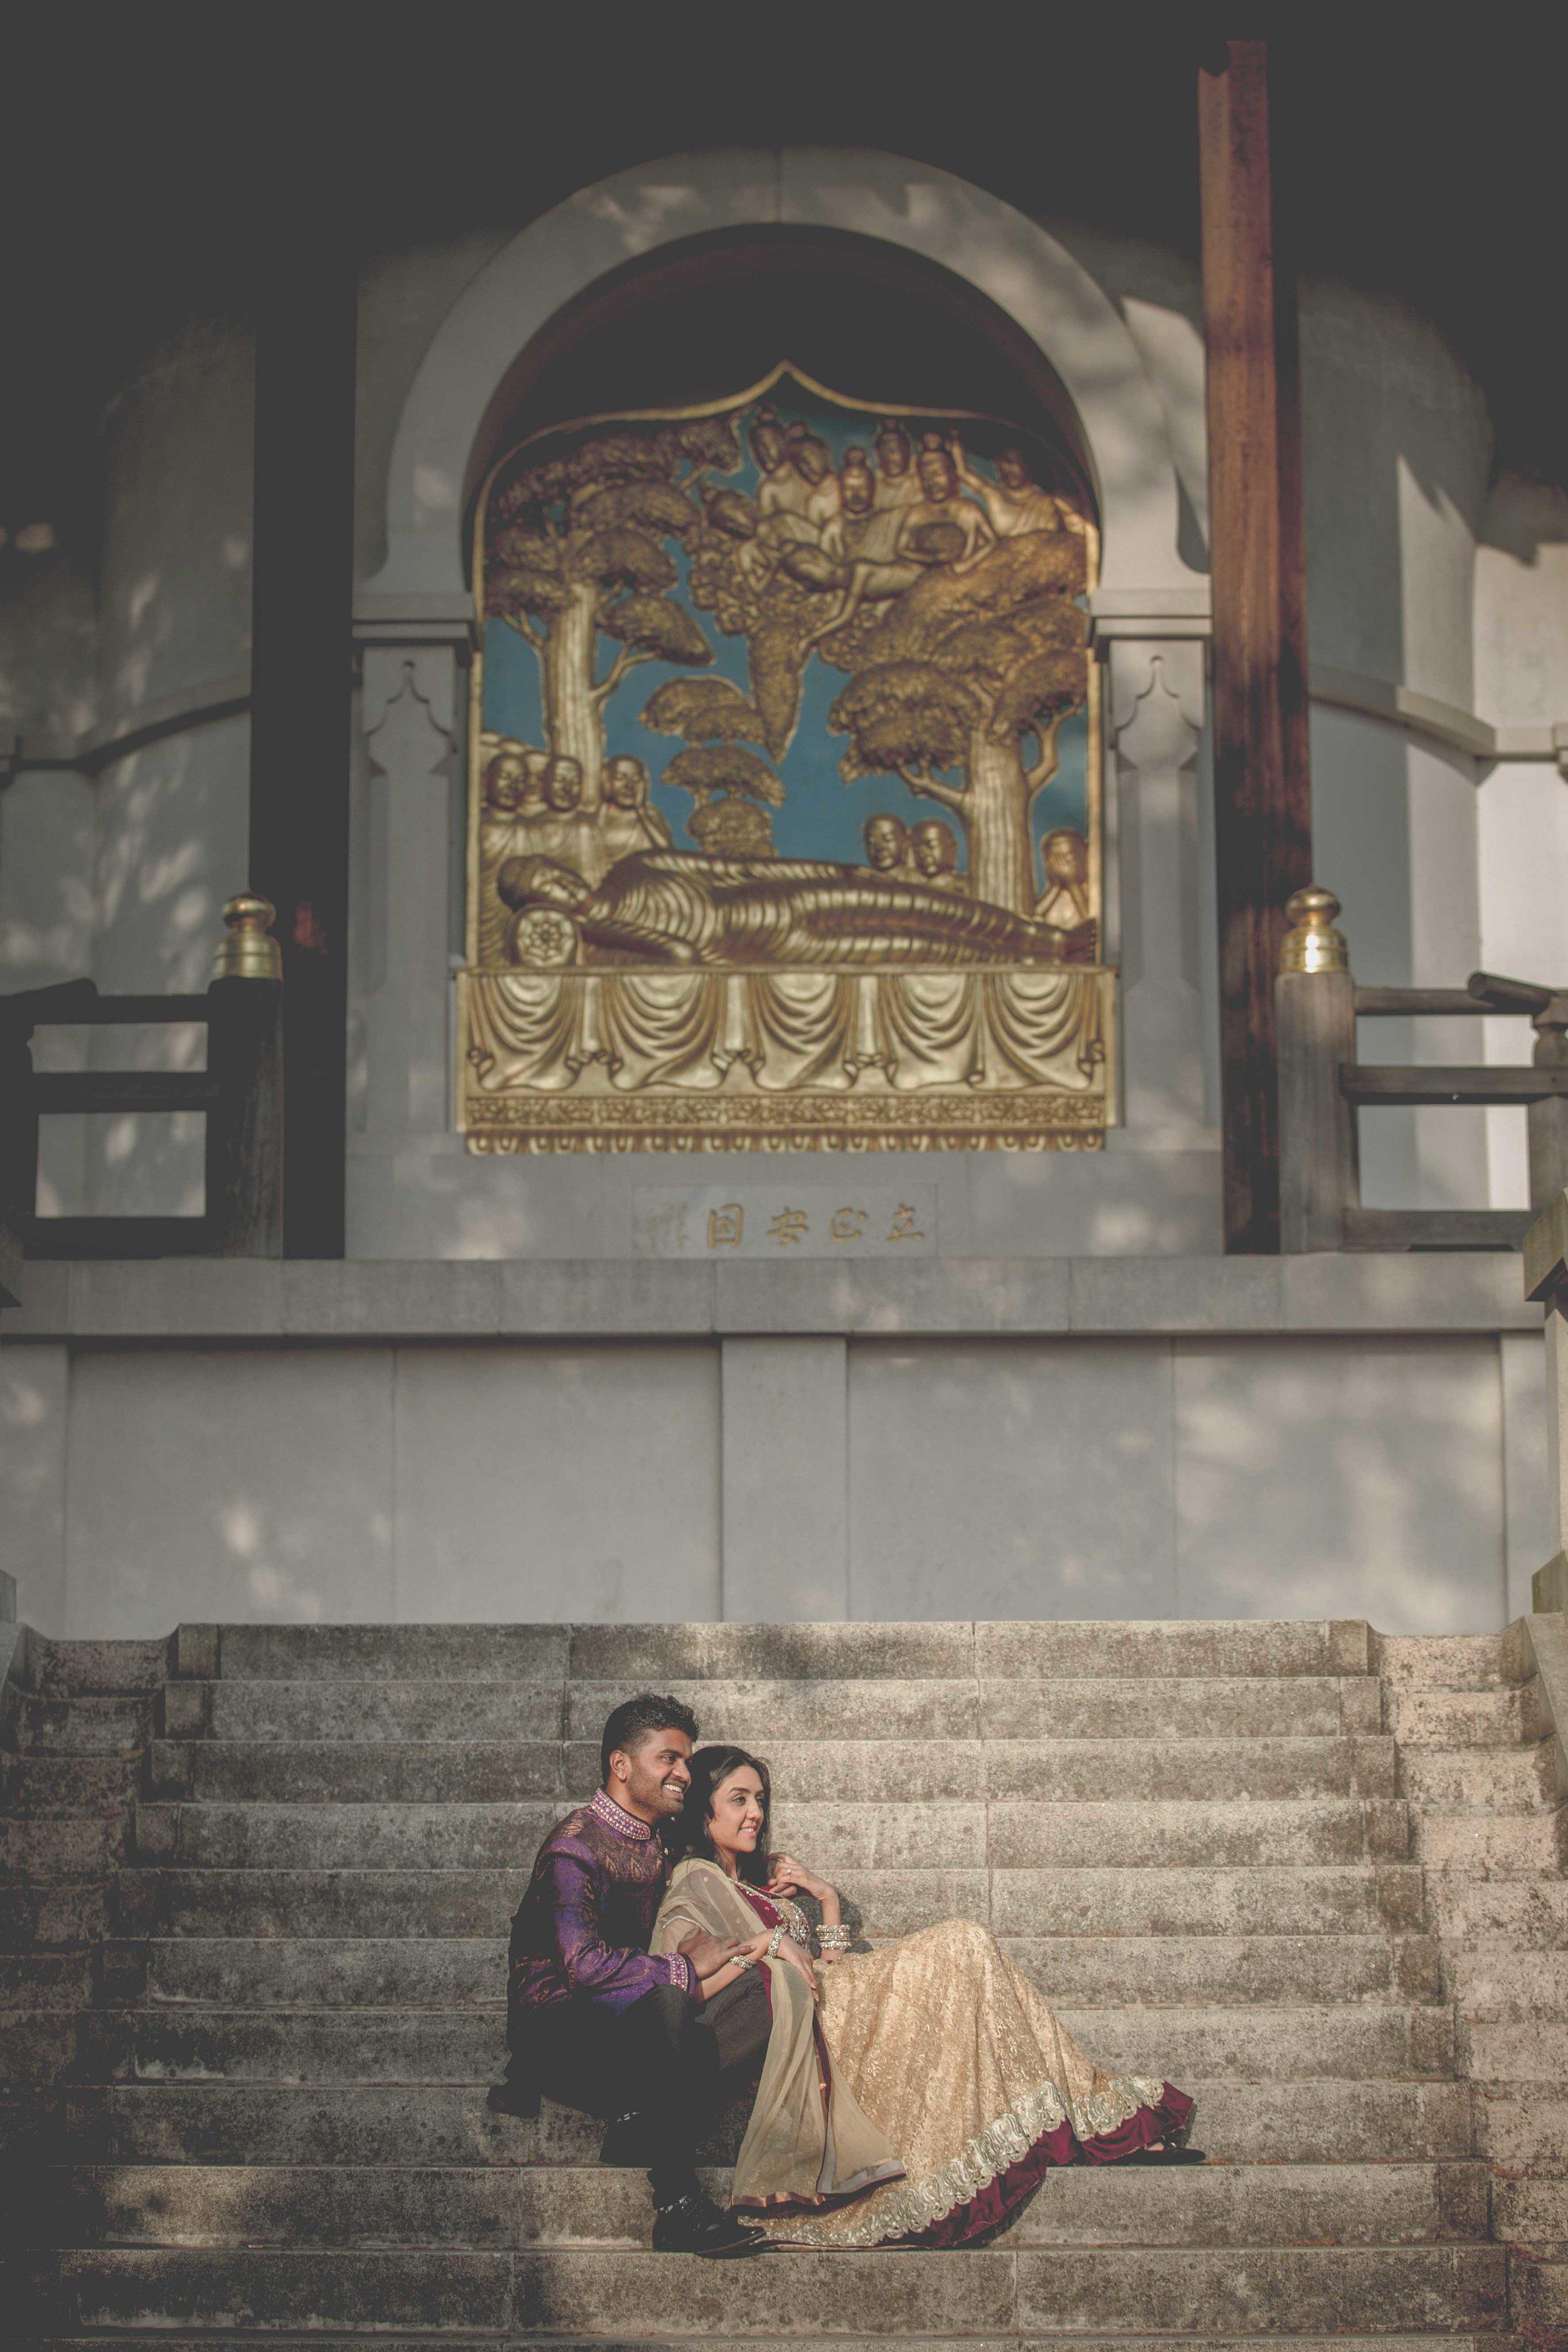 Battersea-park-pre-wedding-photoshoot-shoot-london-asian-wedding-photographer-natalia-smith-photography-10.jpg